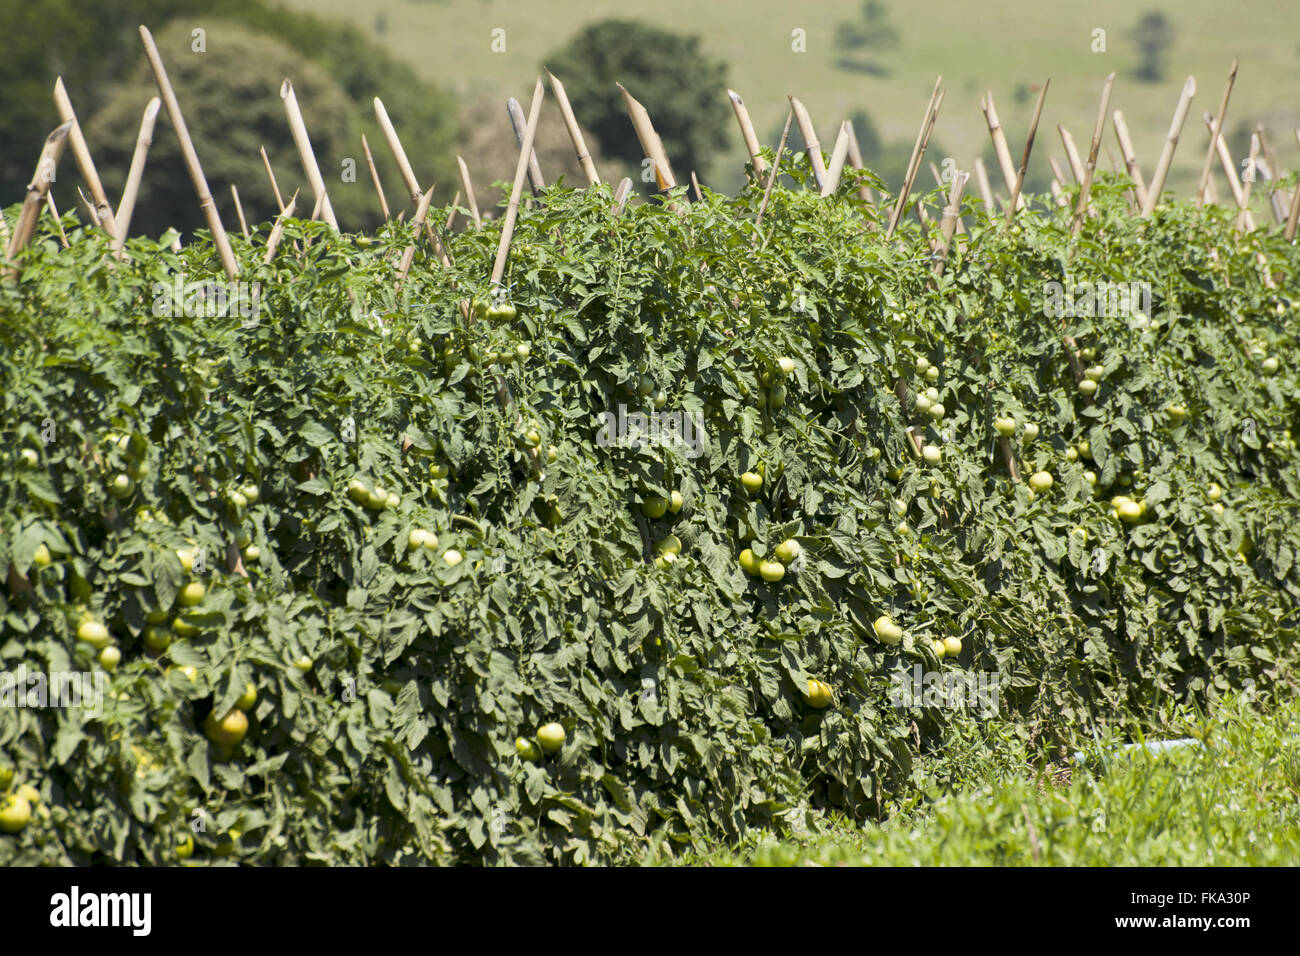 Plantation of envarado tomato variety Alambra in rura area Taquarivaí - Stock Image